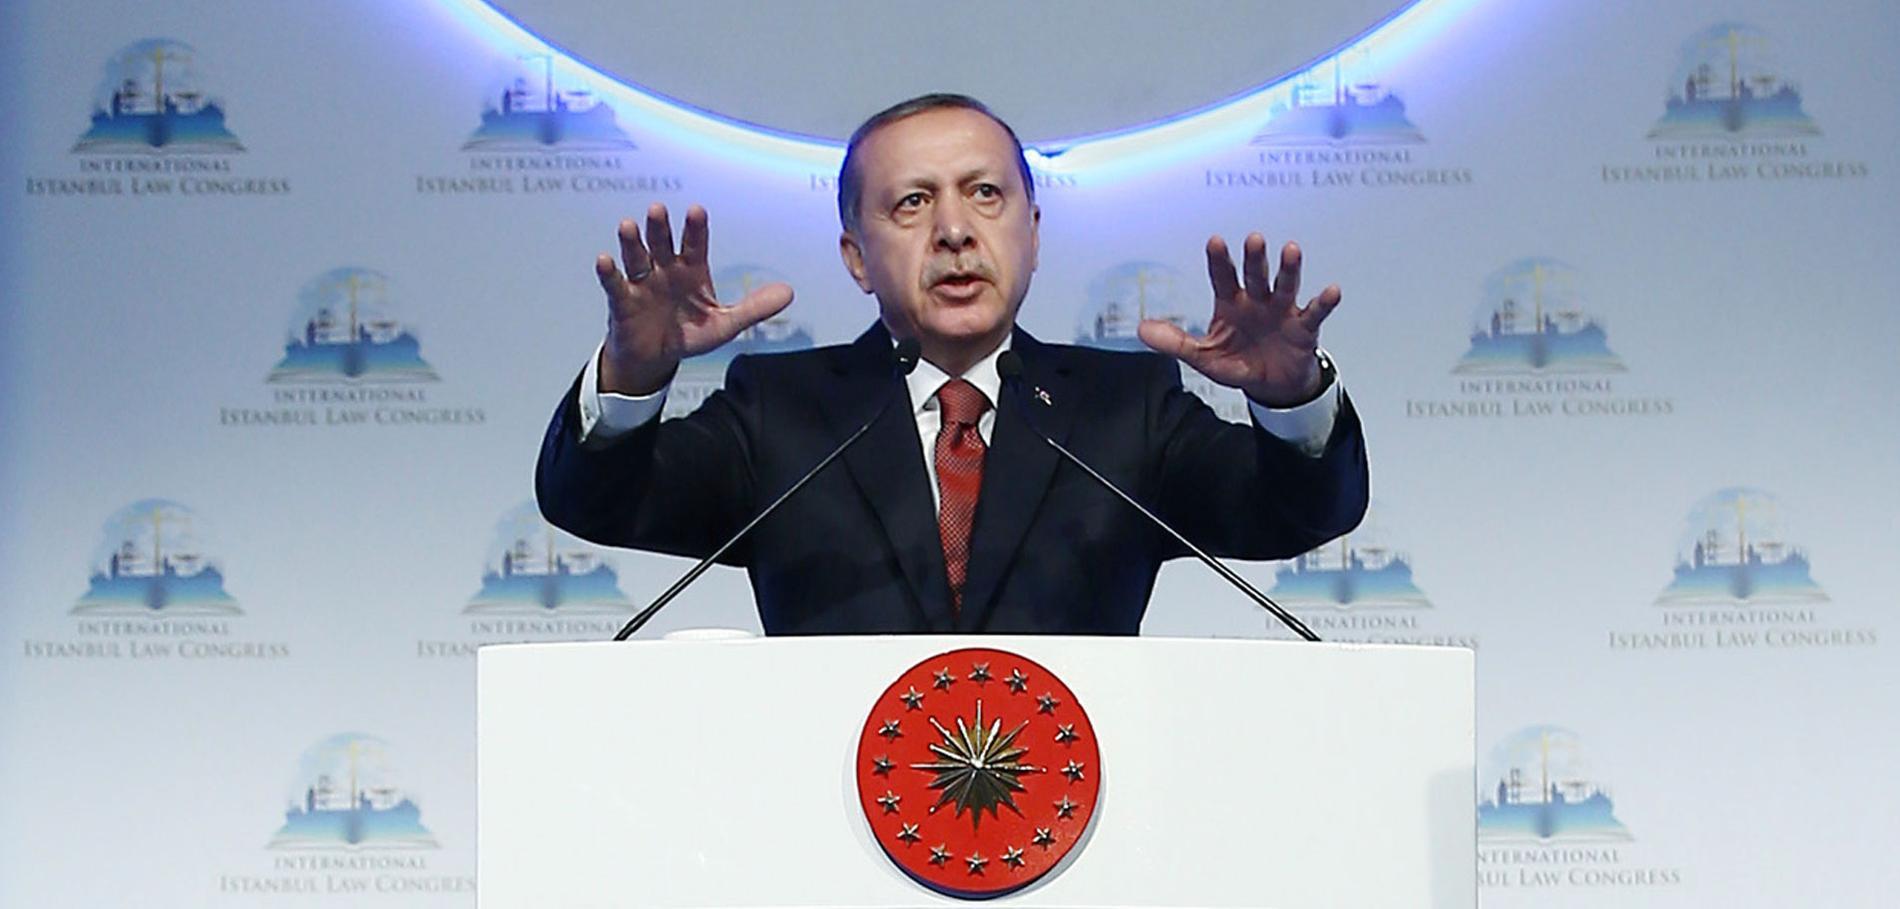 Turkiets president Recep Tayyip Erdogan